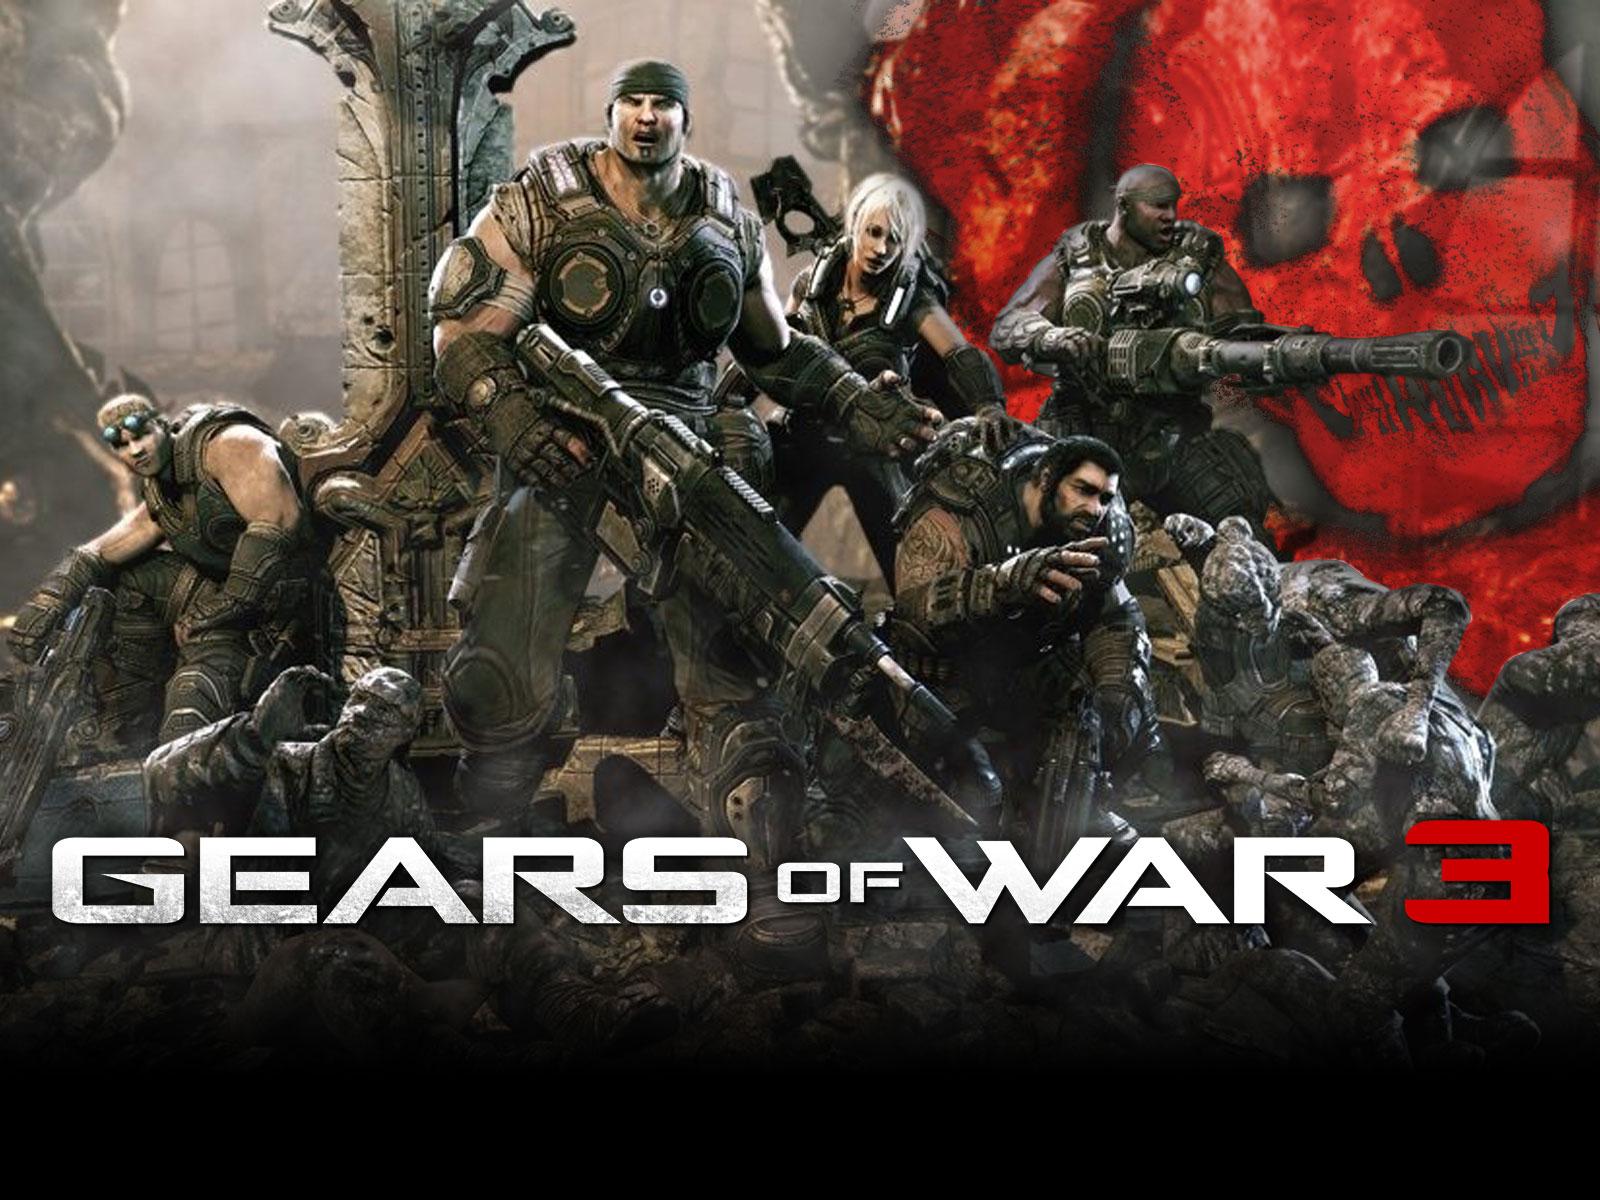 Gears Of War Wallpaper 1600x1200 67527